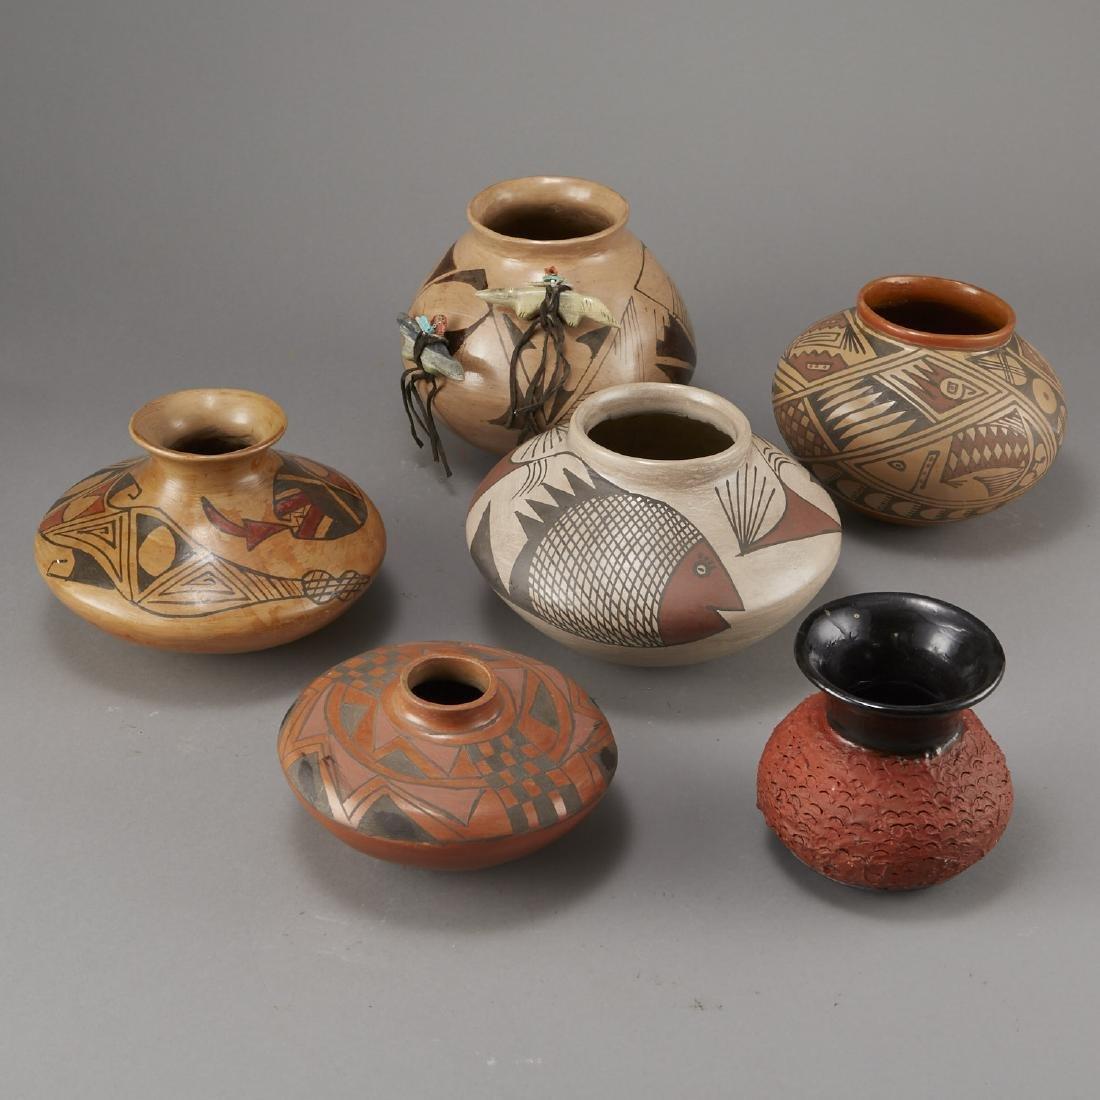 Group of 6 Polychrome Jars Fetish